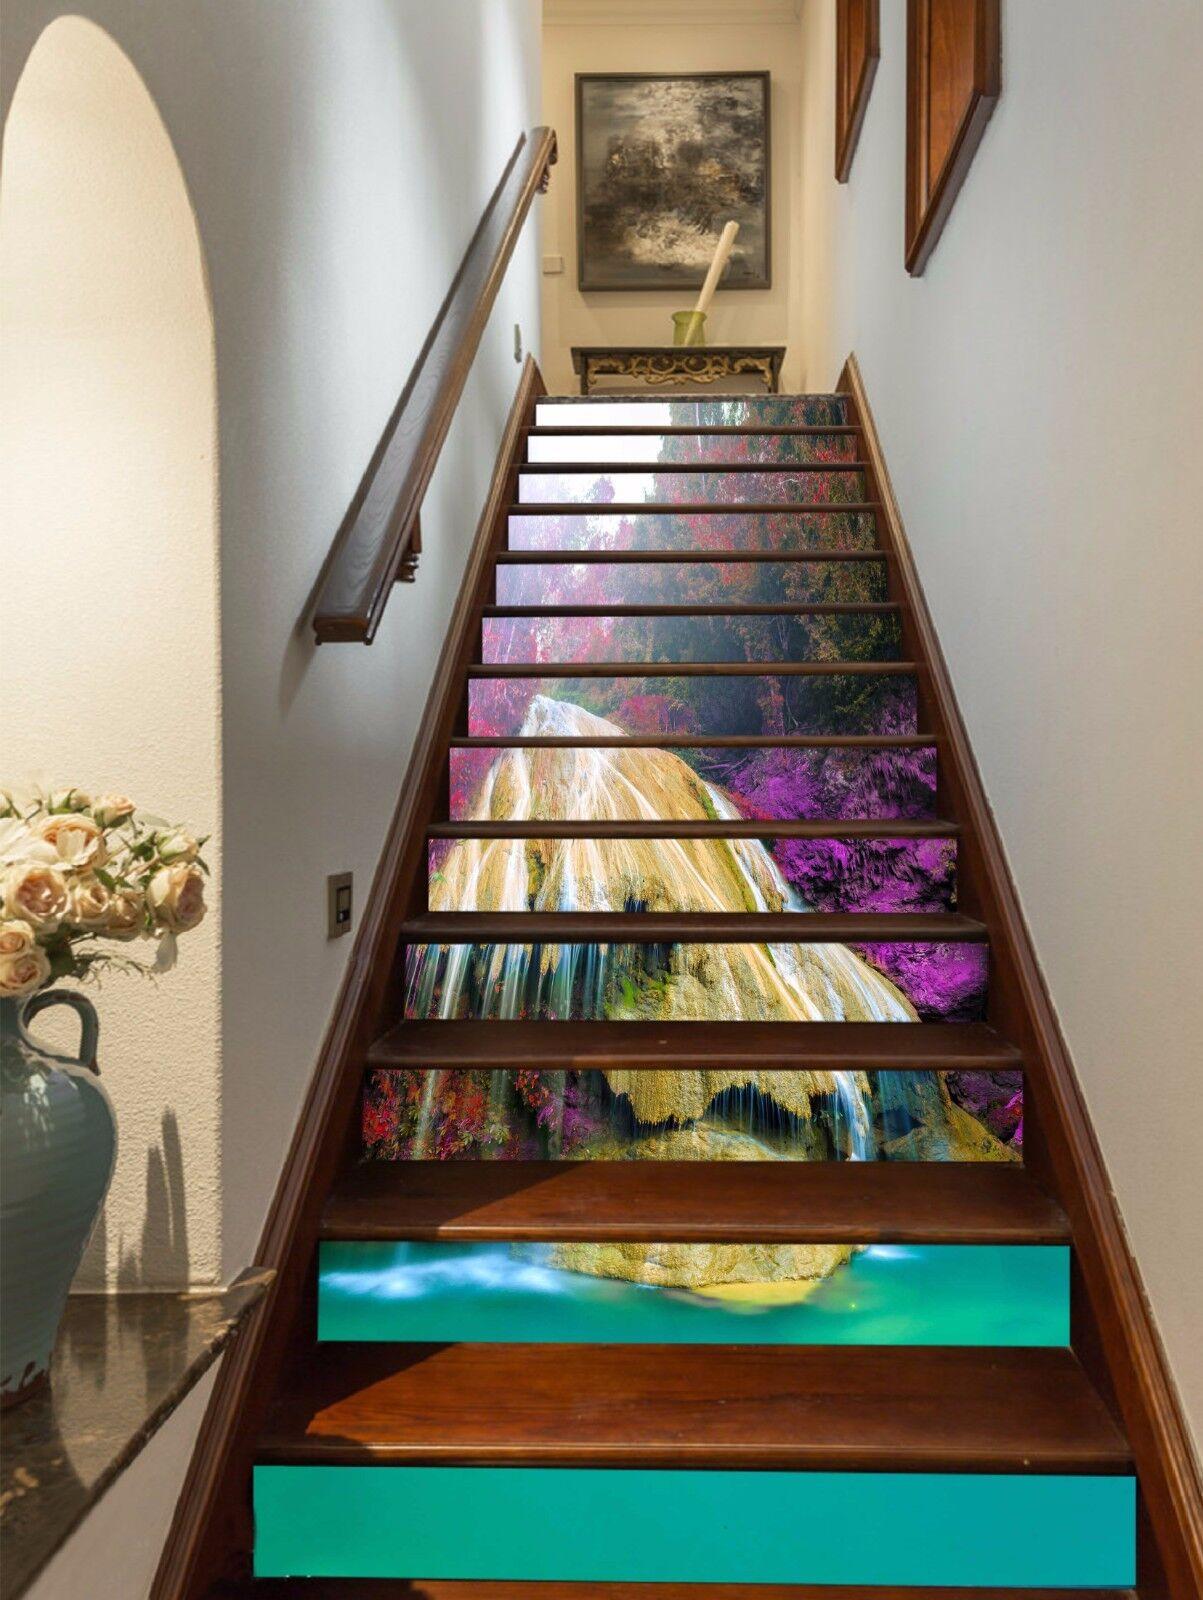 3D FFaibleing Creek 14 Stair Risers Decoration Photo Mural Vinyl Decal Wallpaper AU